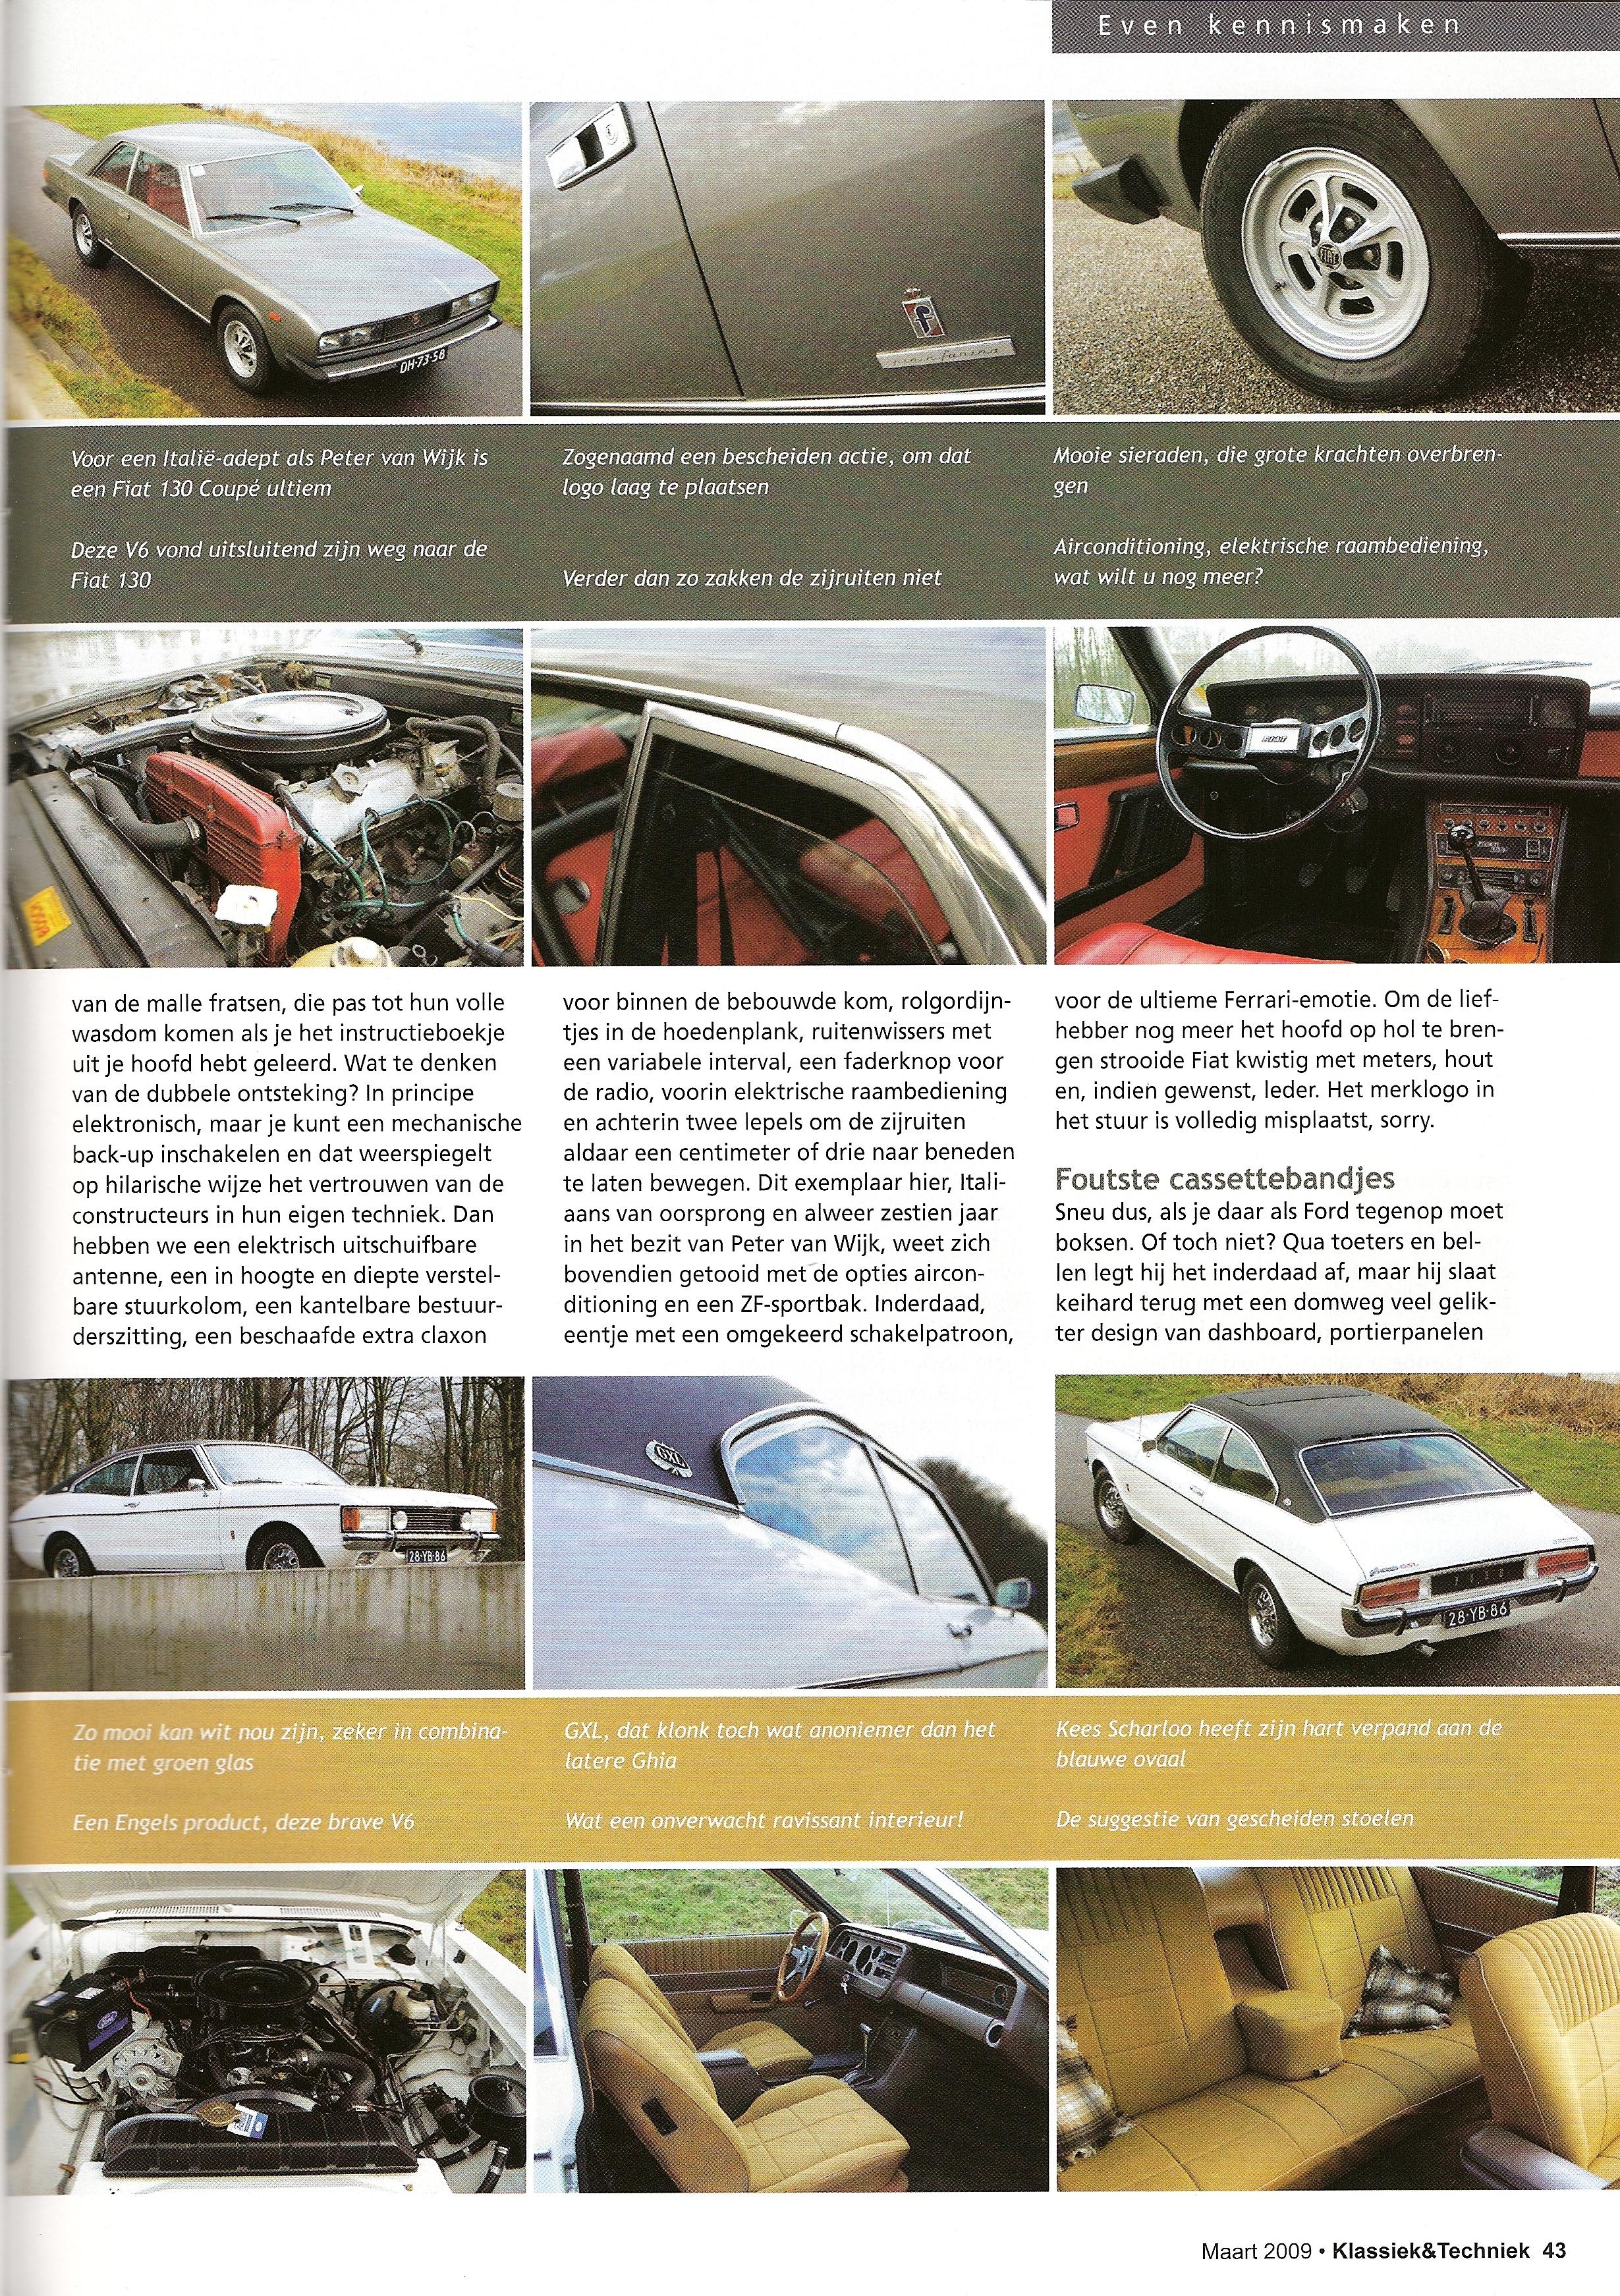 Klassiek & Techniek: Fiat 130 Coupe en Ford Granada